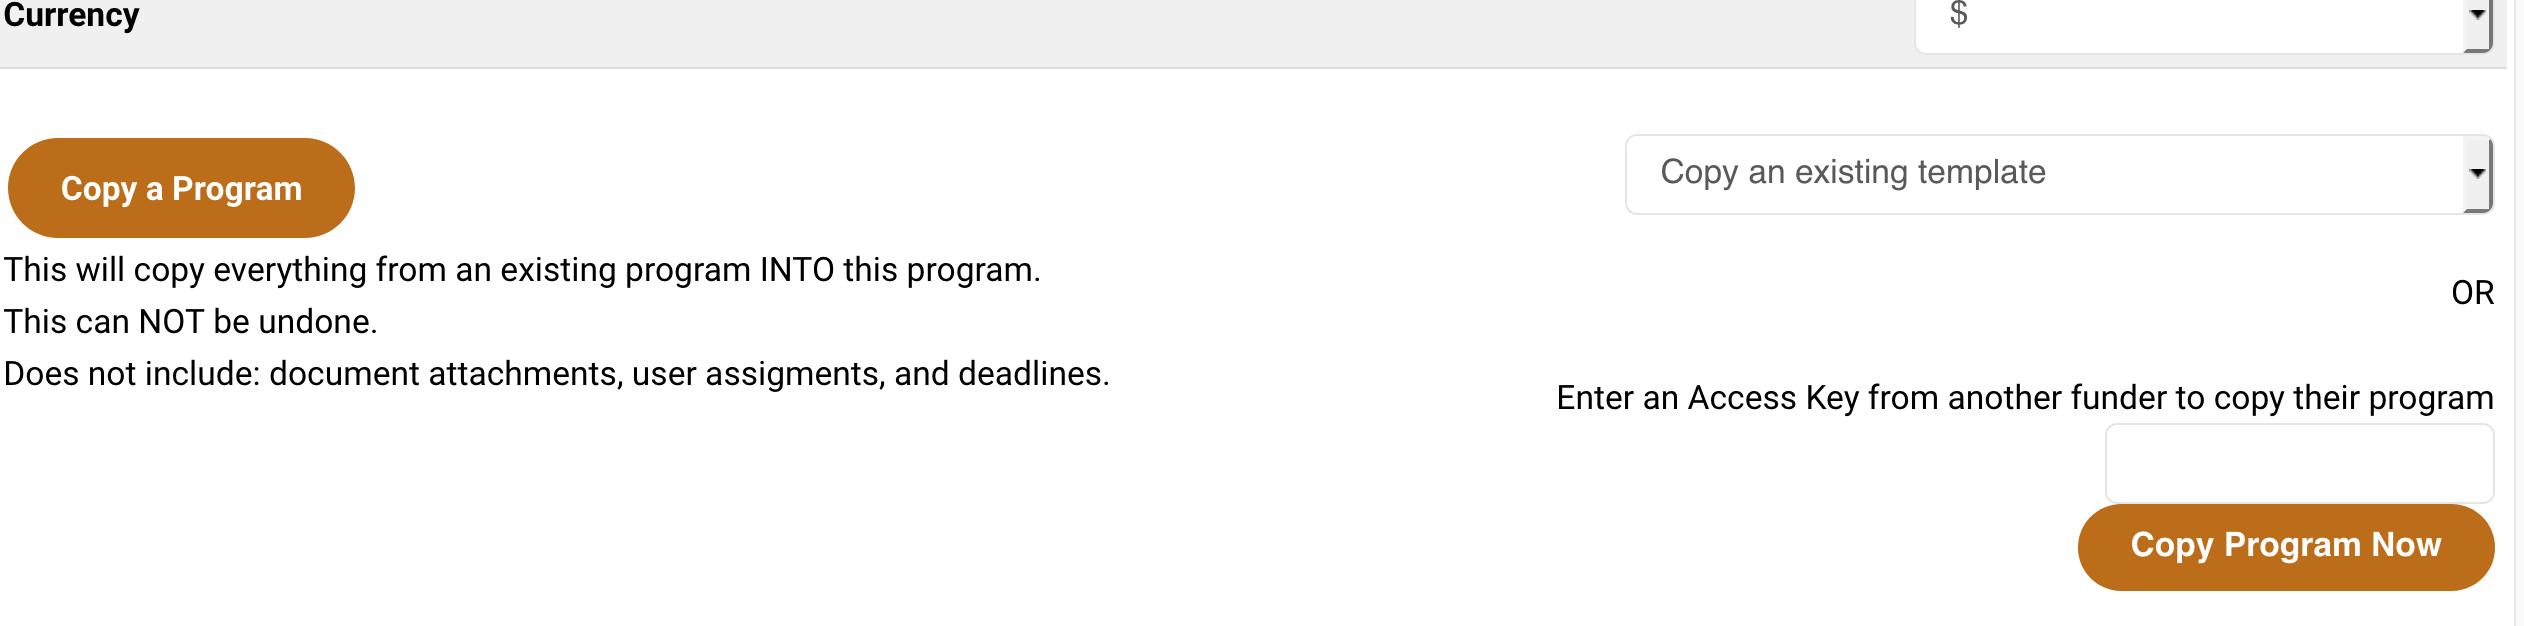 Copy Program Button